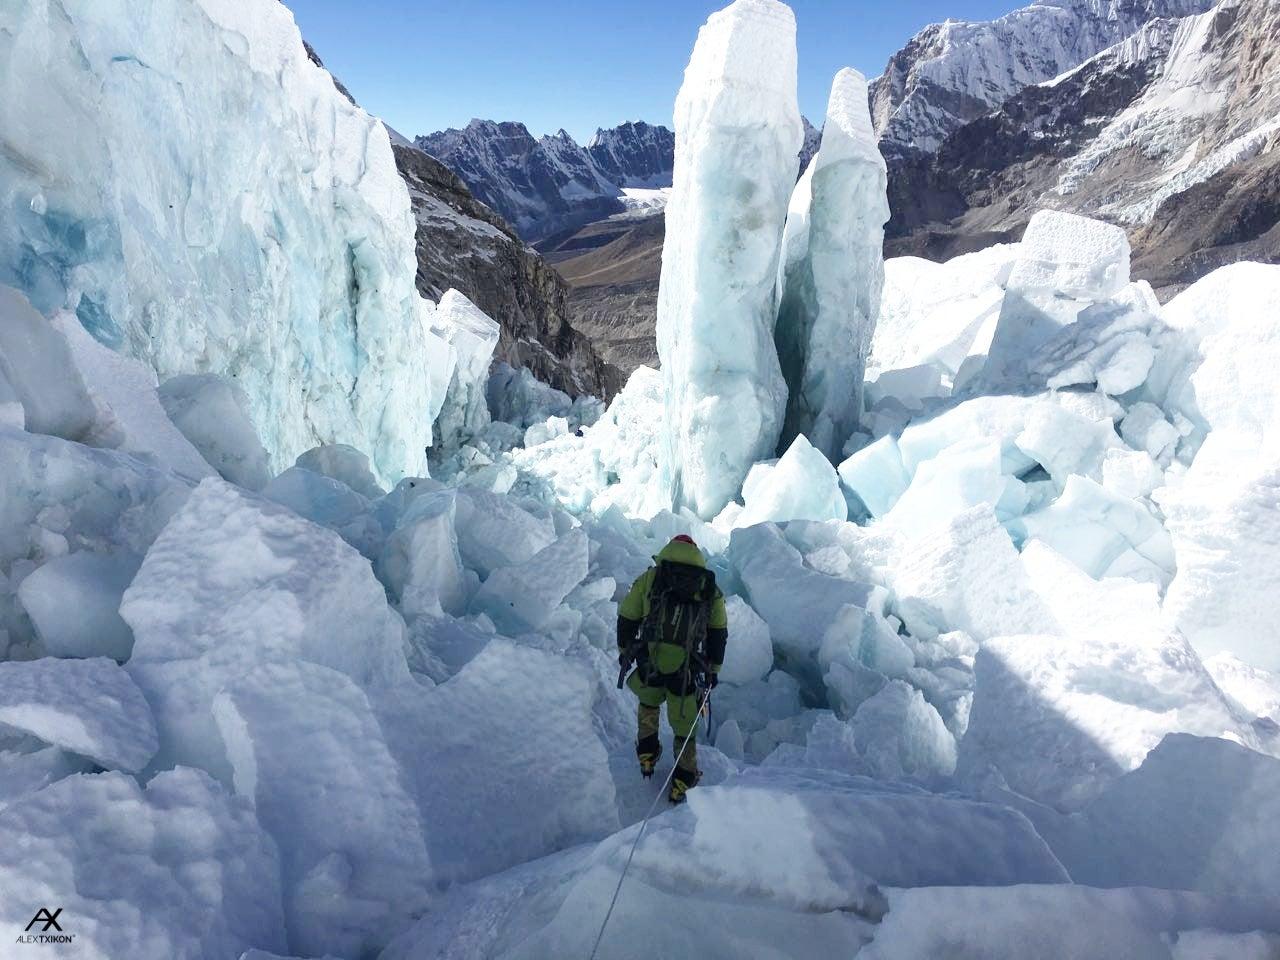 Txikon in the Khumbu icefall last winter. Photo © Alex Txikon.